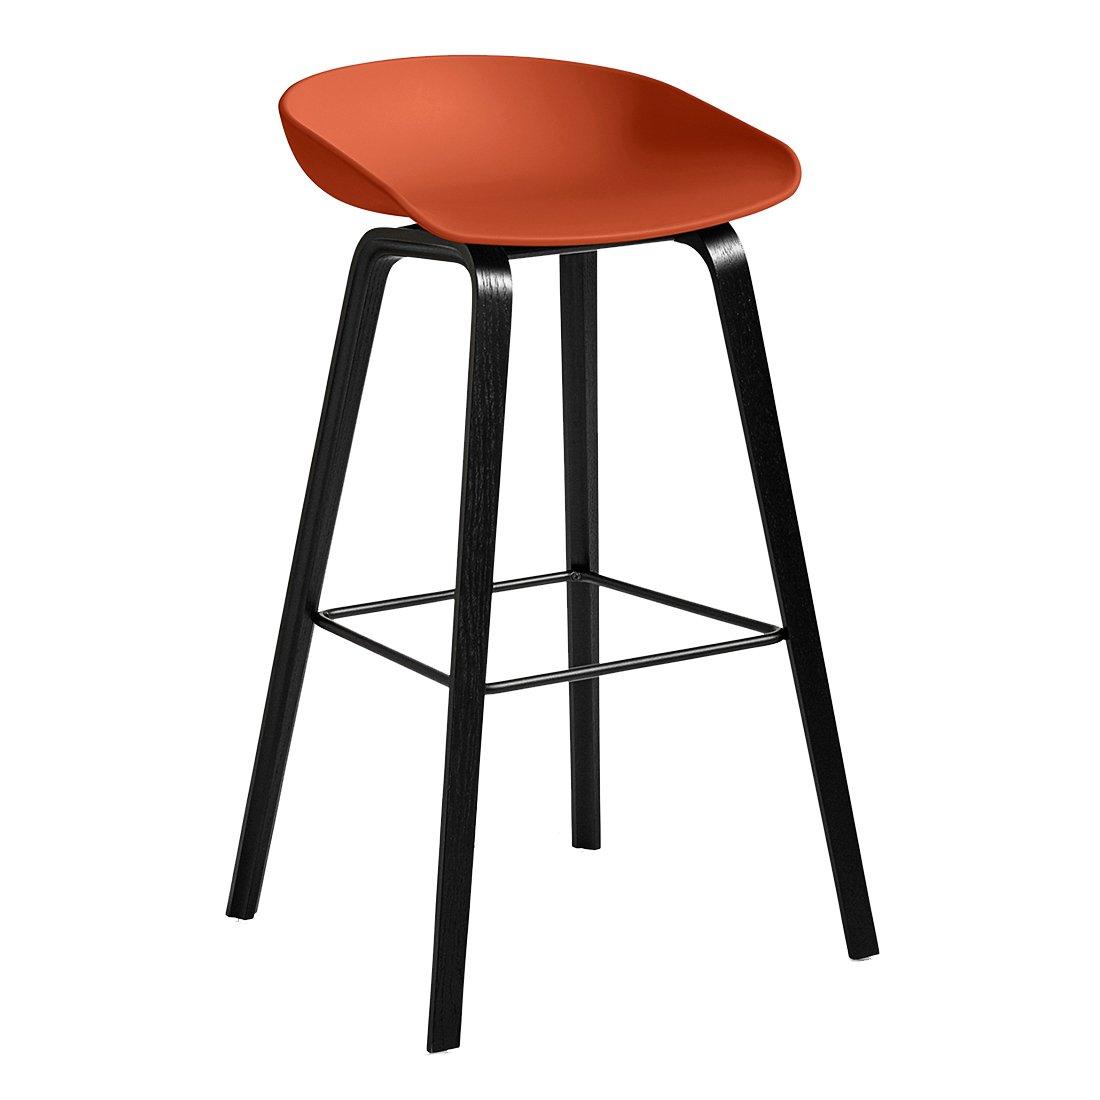 HAY About A Stool AAS 32 Barkruk Zwart Gelakt 64 cm Oranje